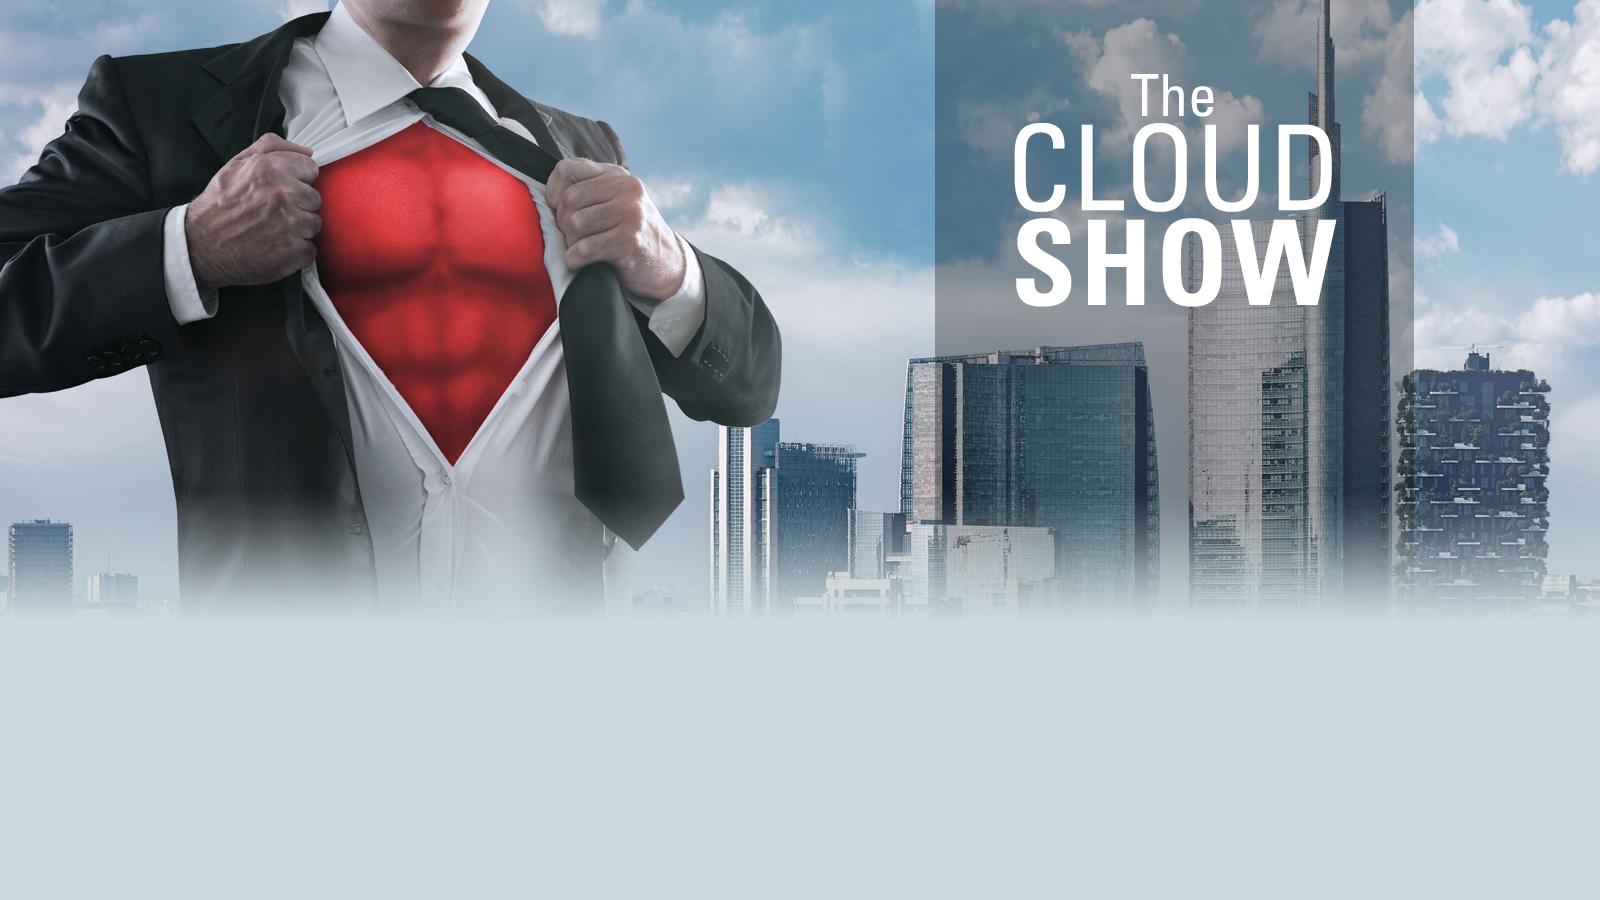 The Cloud Show